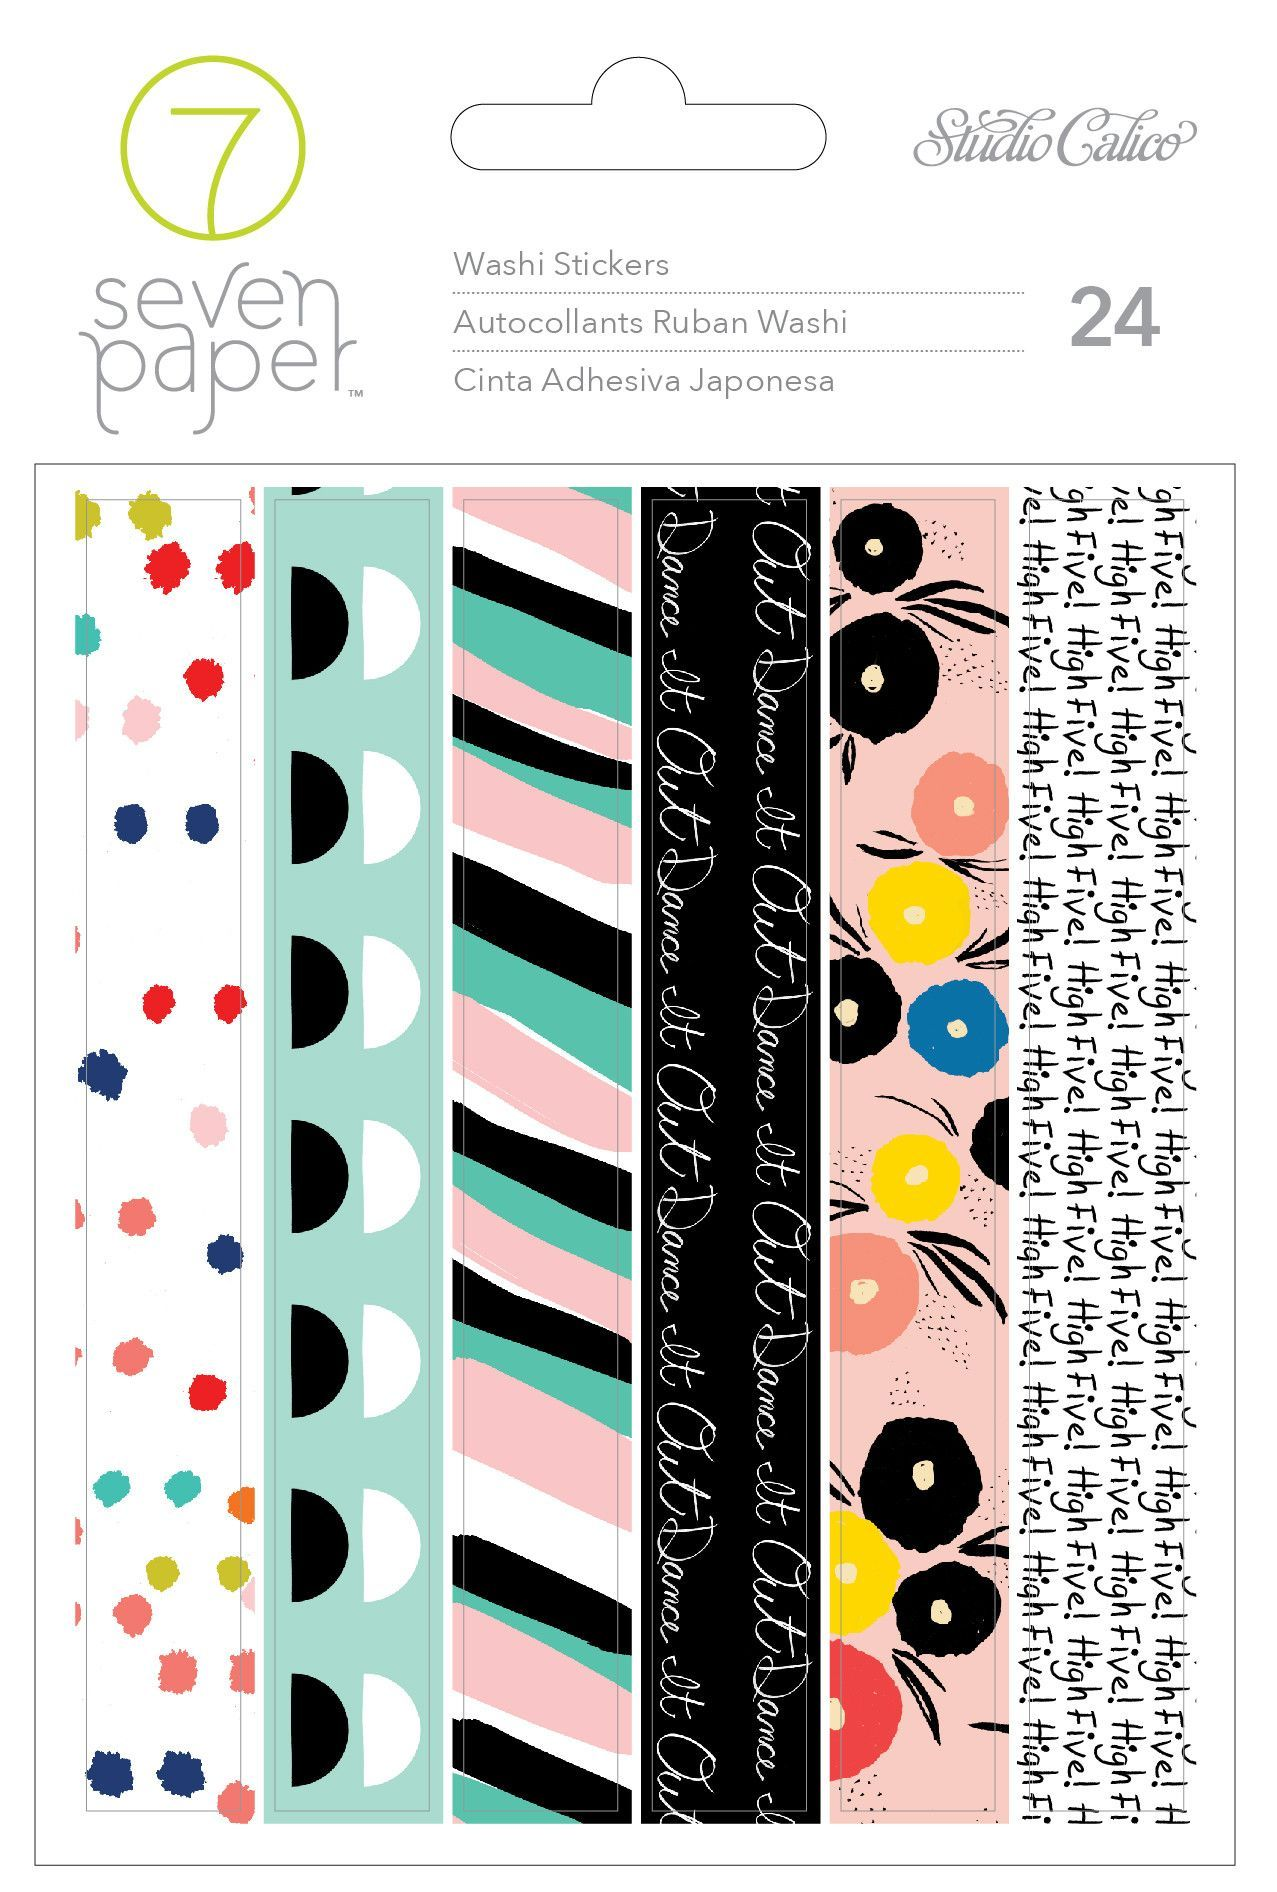 Scrapbook paper dollar general - American Crafts 4 Sheets 24 Piece Studio Calico Goldie Washi Tape Sticker Book Relationships At Dollar General